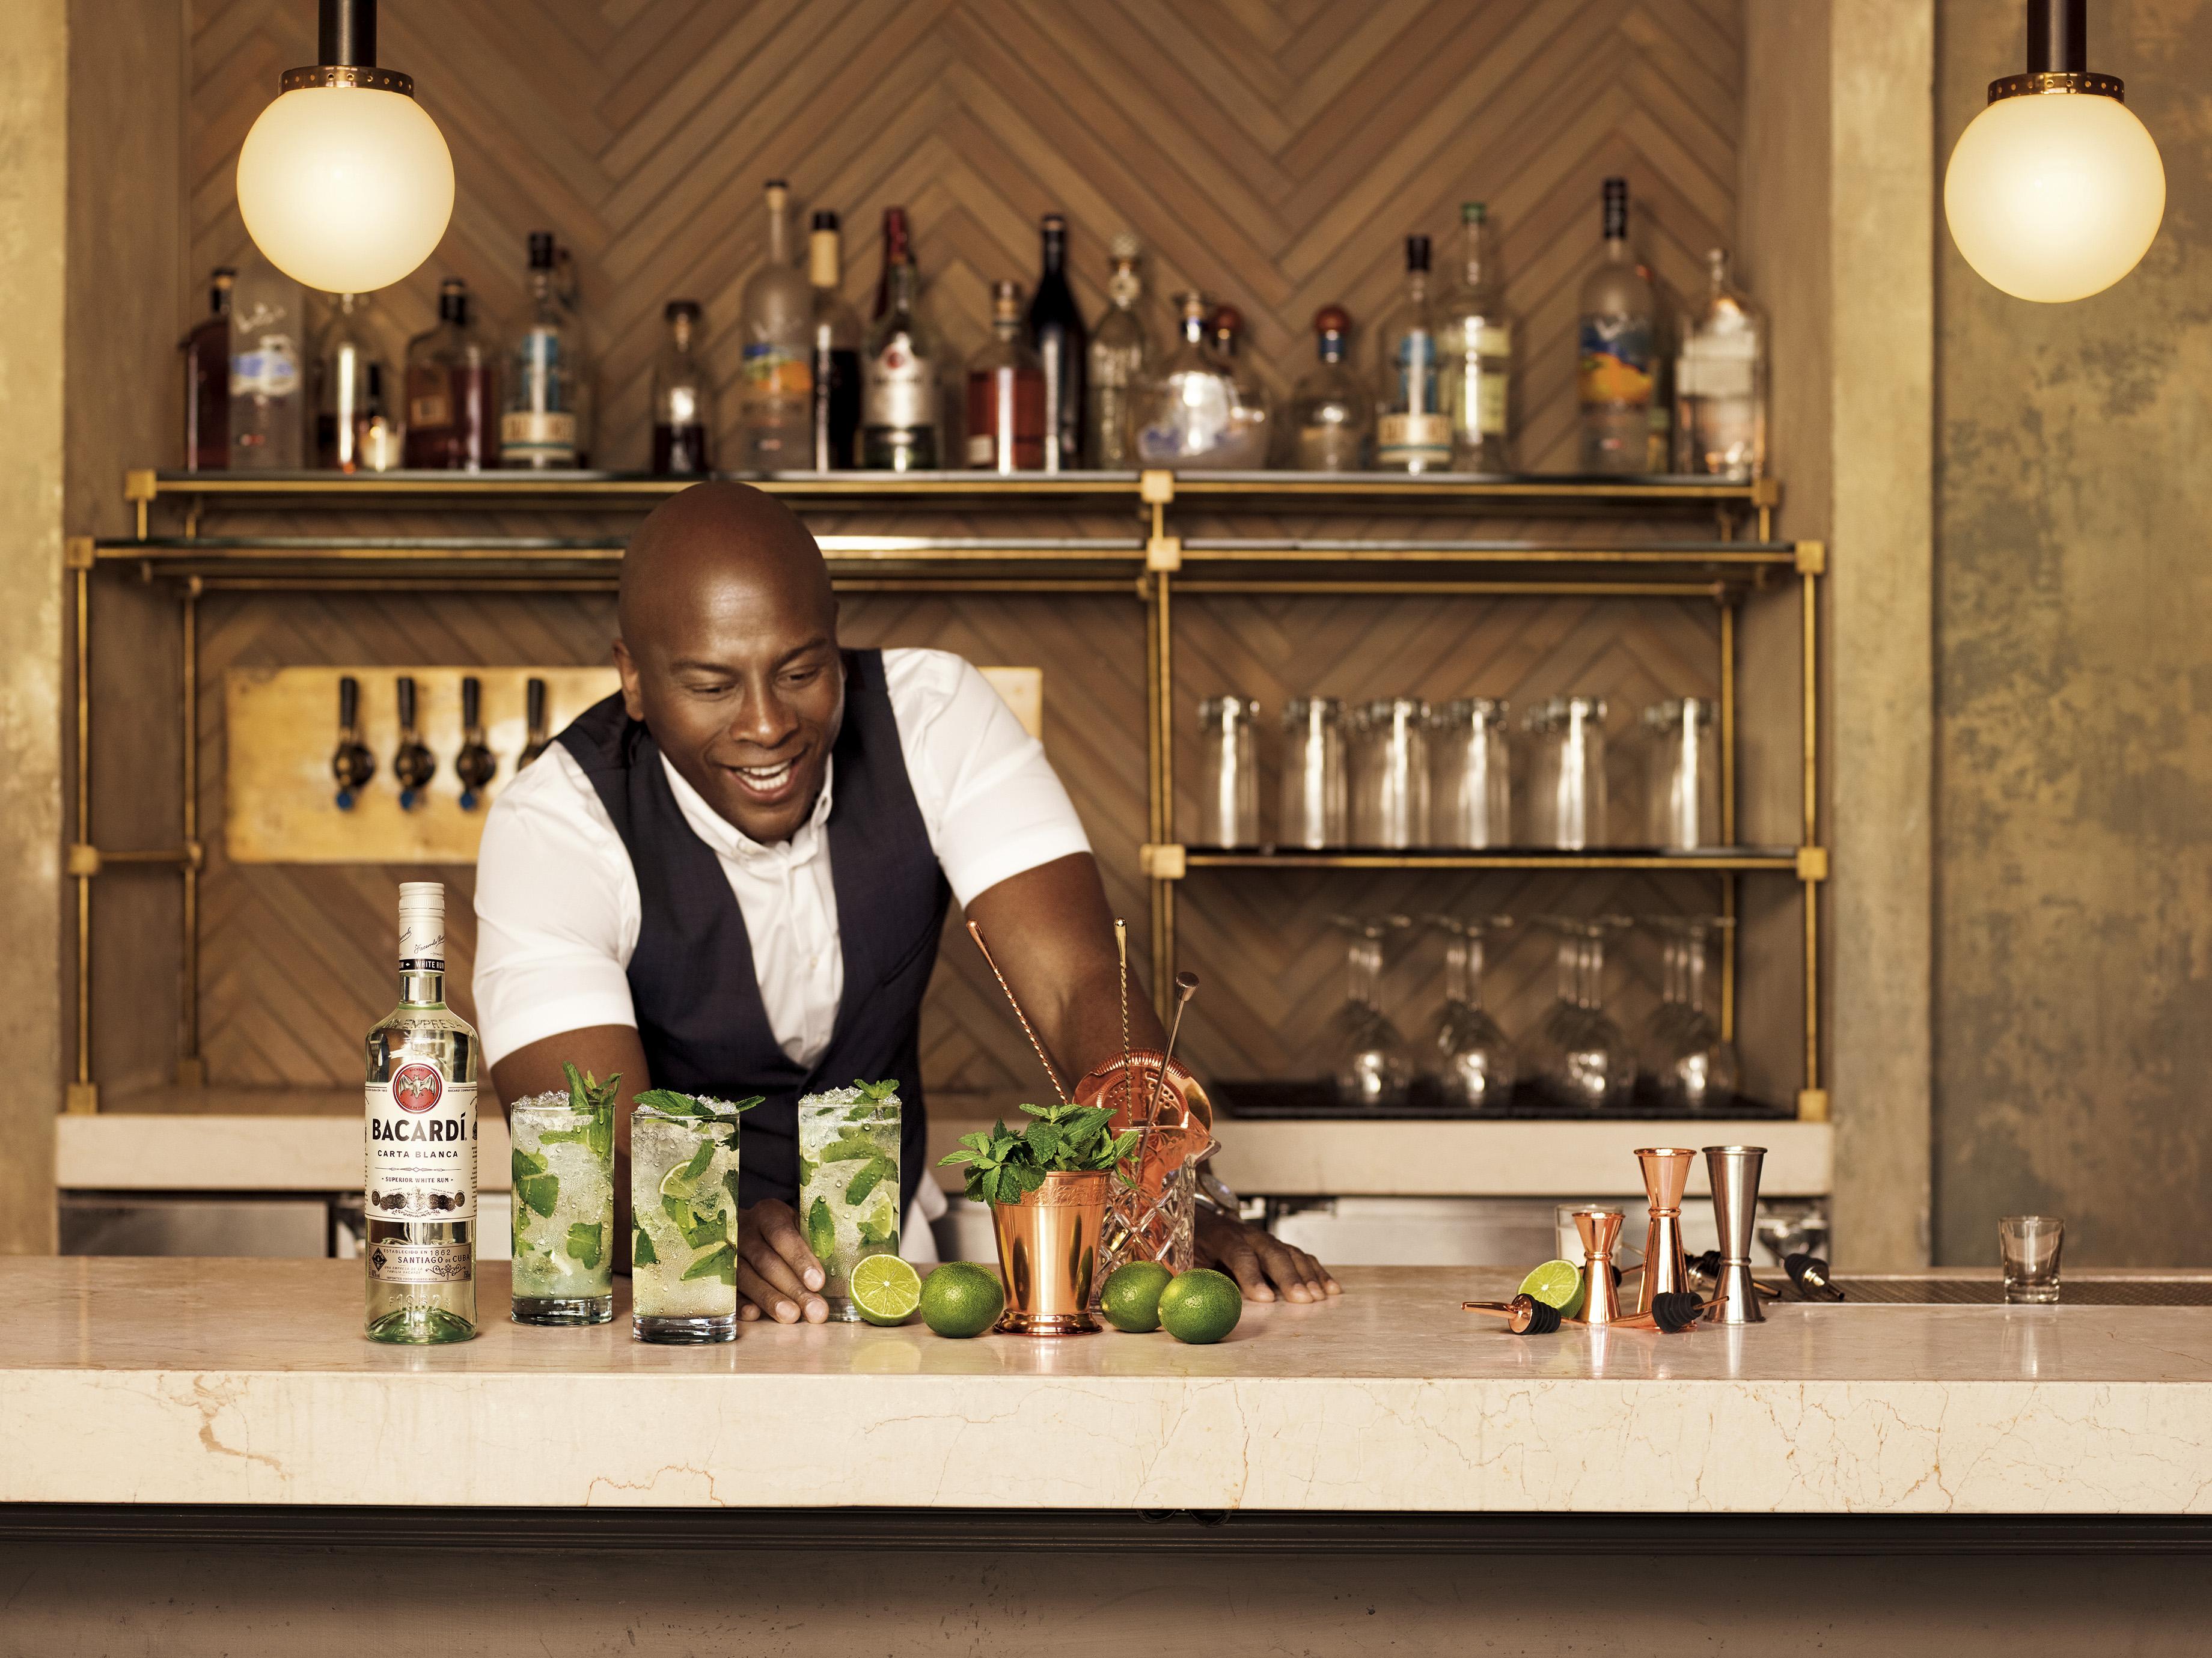 BBDO NY - Bacardi - Bartender